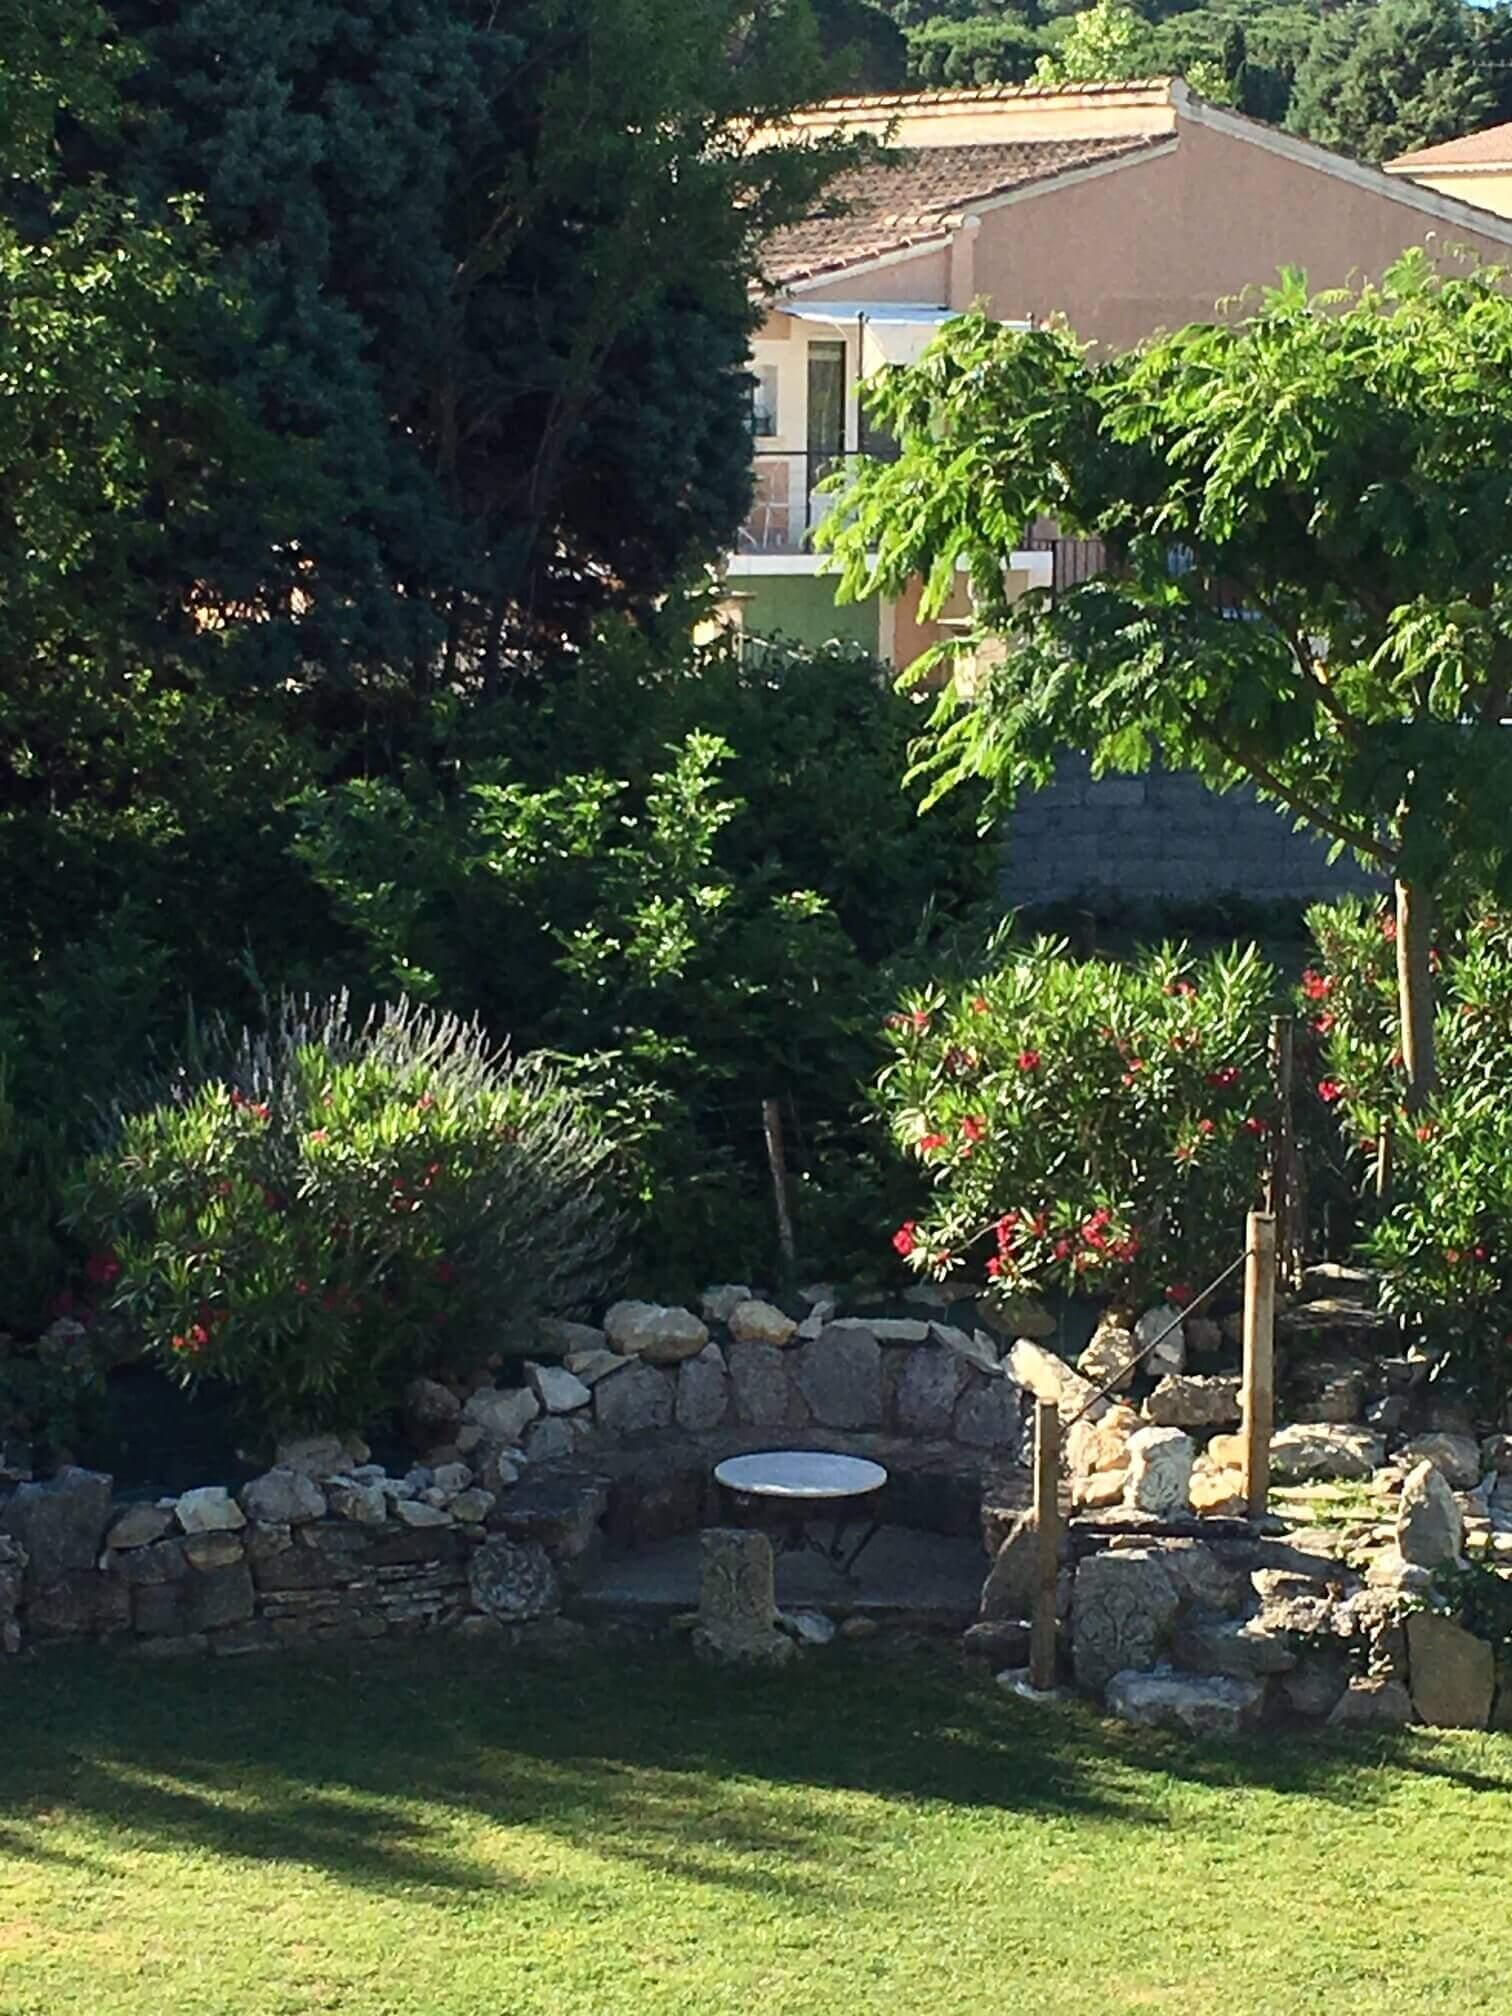 Jolie Gîte avec jardin et piscine